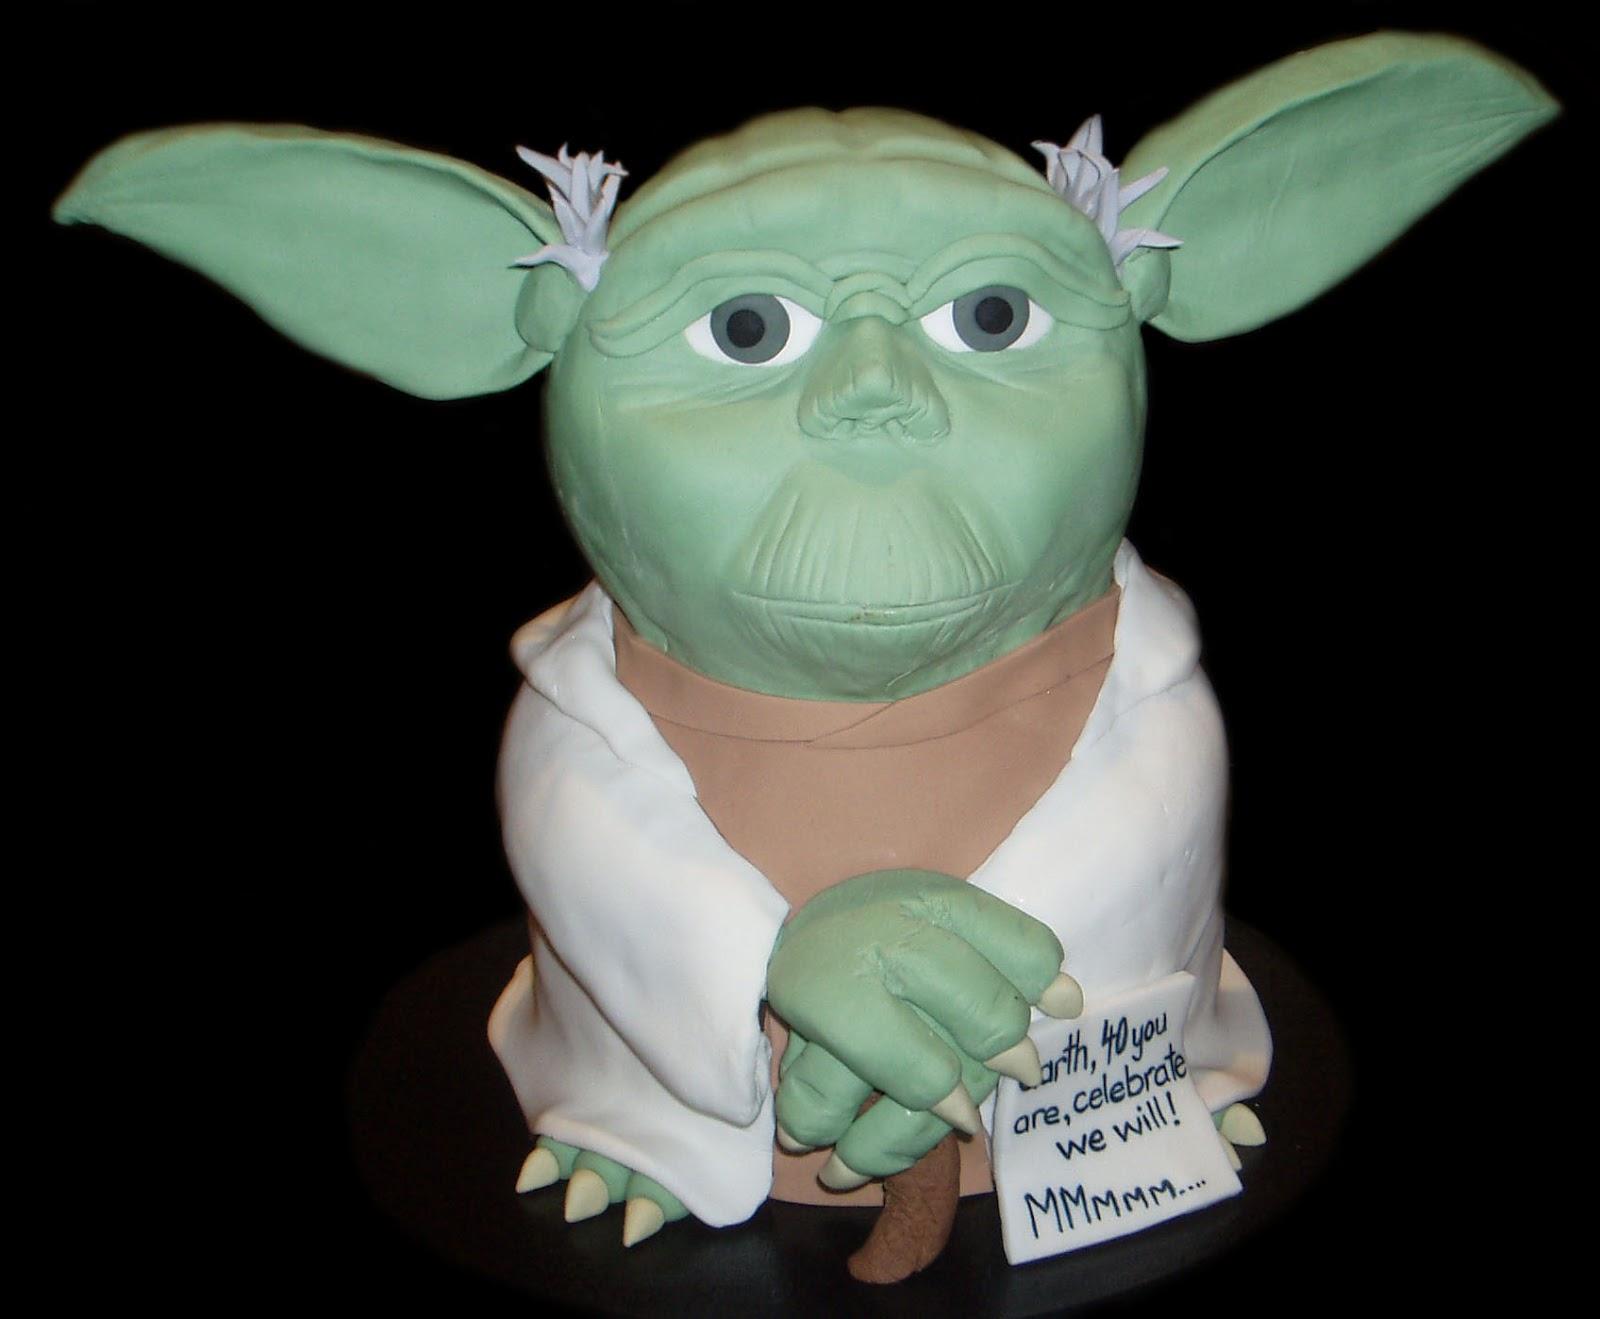 Nadas Cakes Star Wars Yoda Birthday Cake By Nadas Cakes Canberra